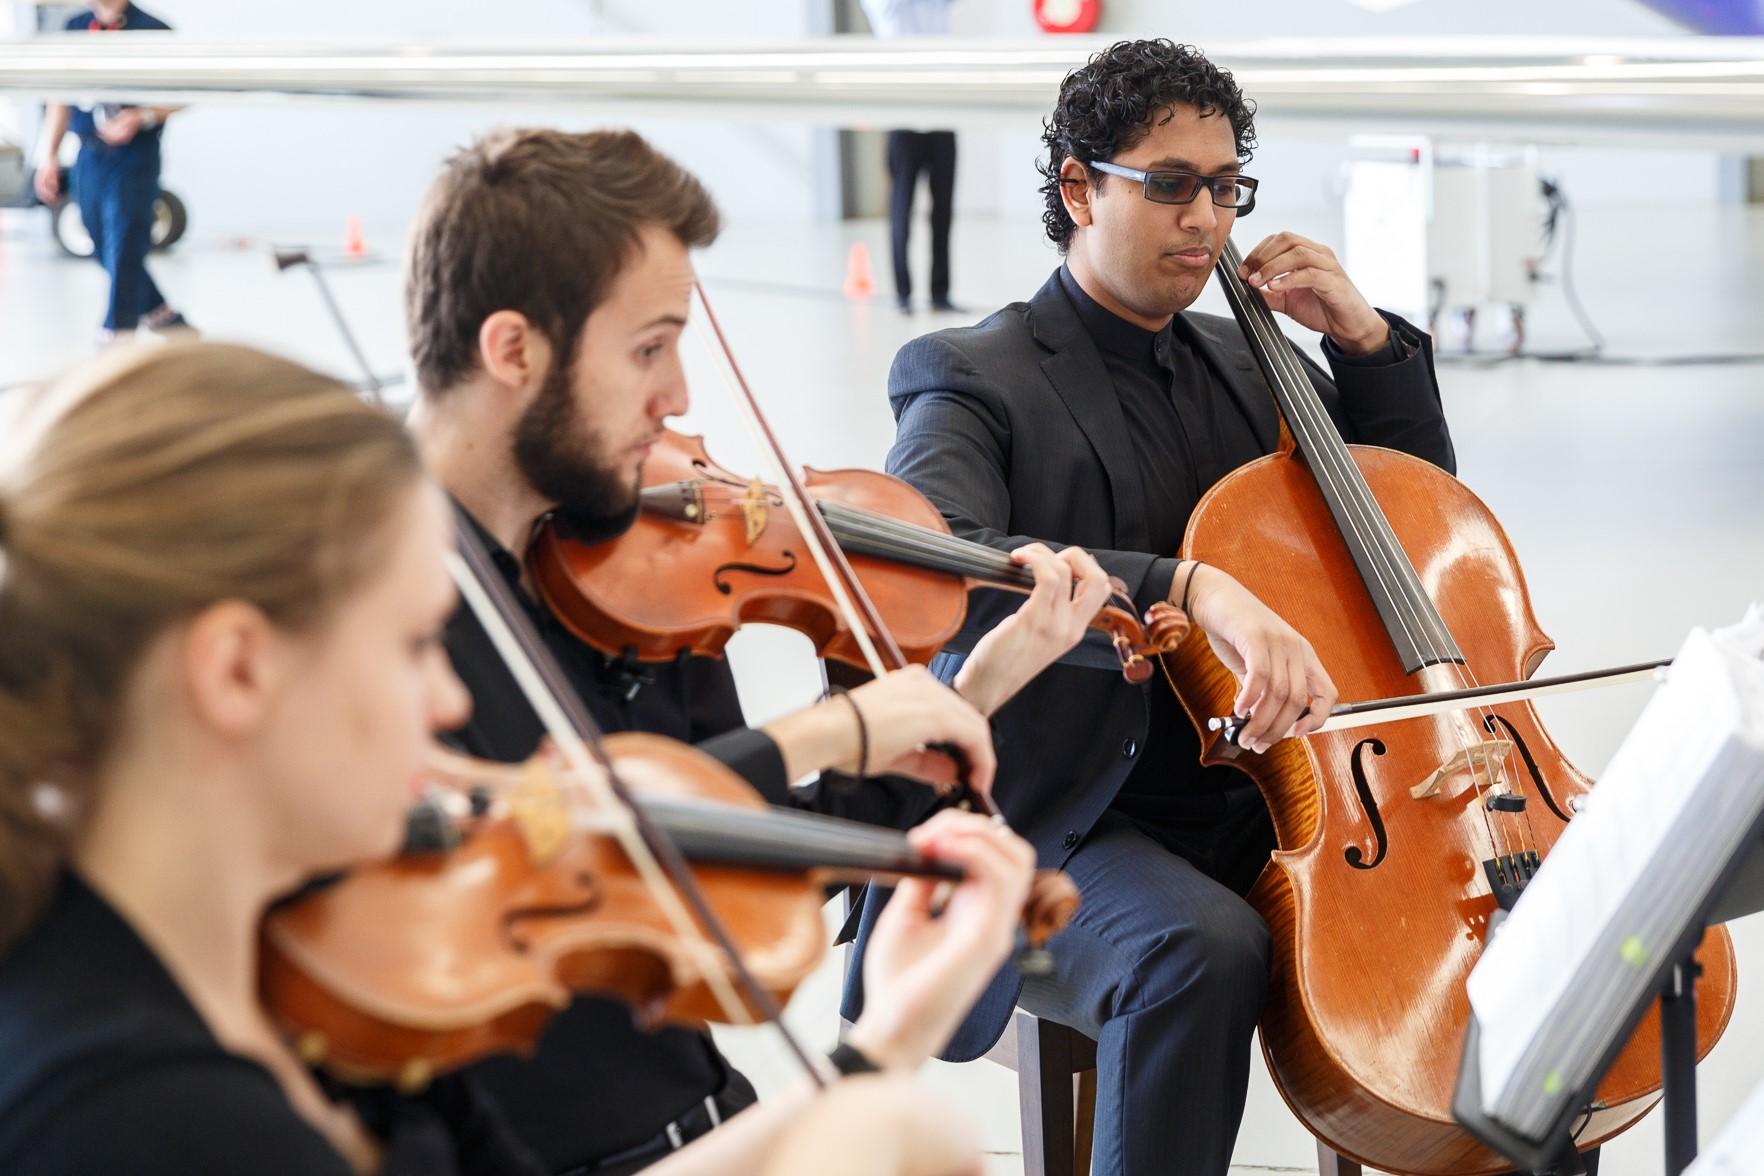 wedding-ceremony-reception-corporate-music-entertainment-perth-south-west-string-quartet-trio-orchestra (1).jpg